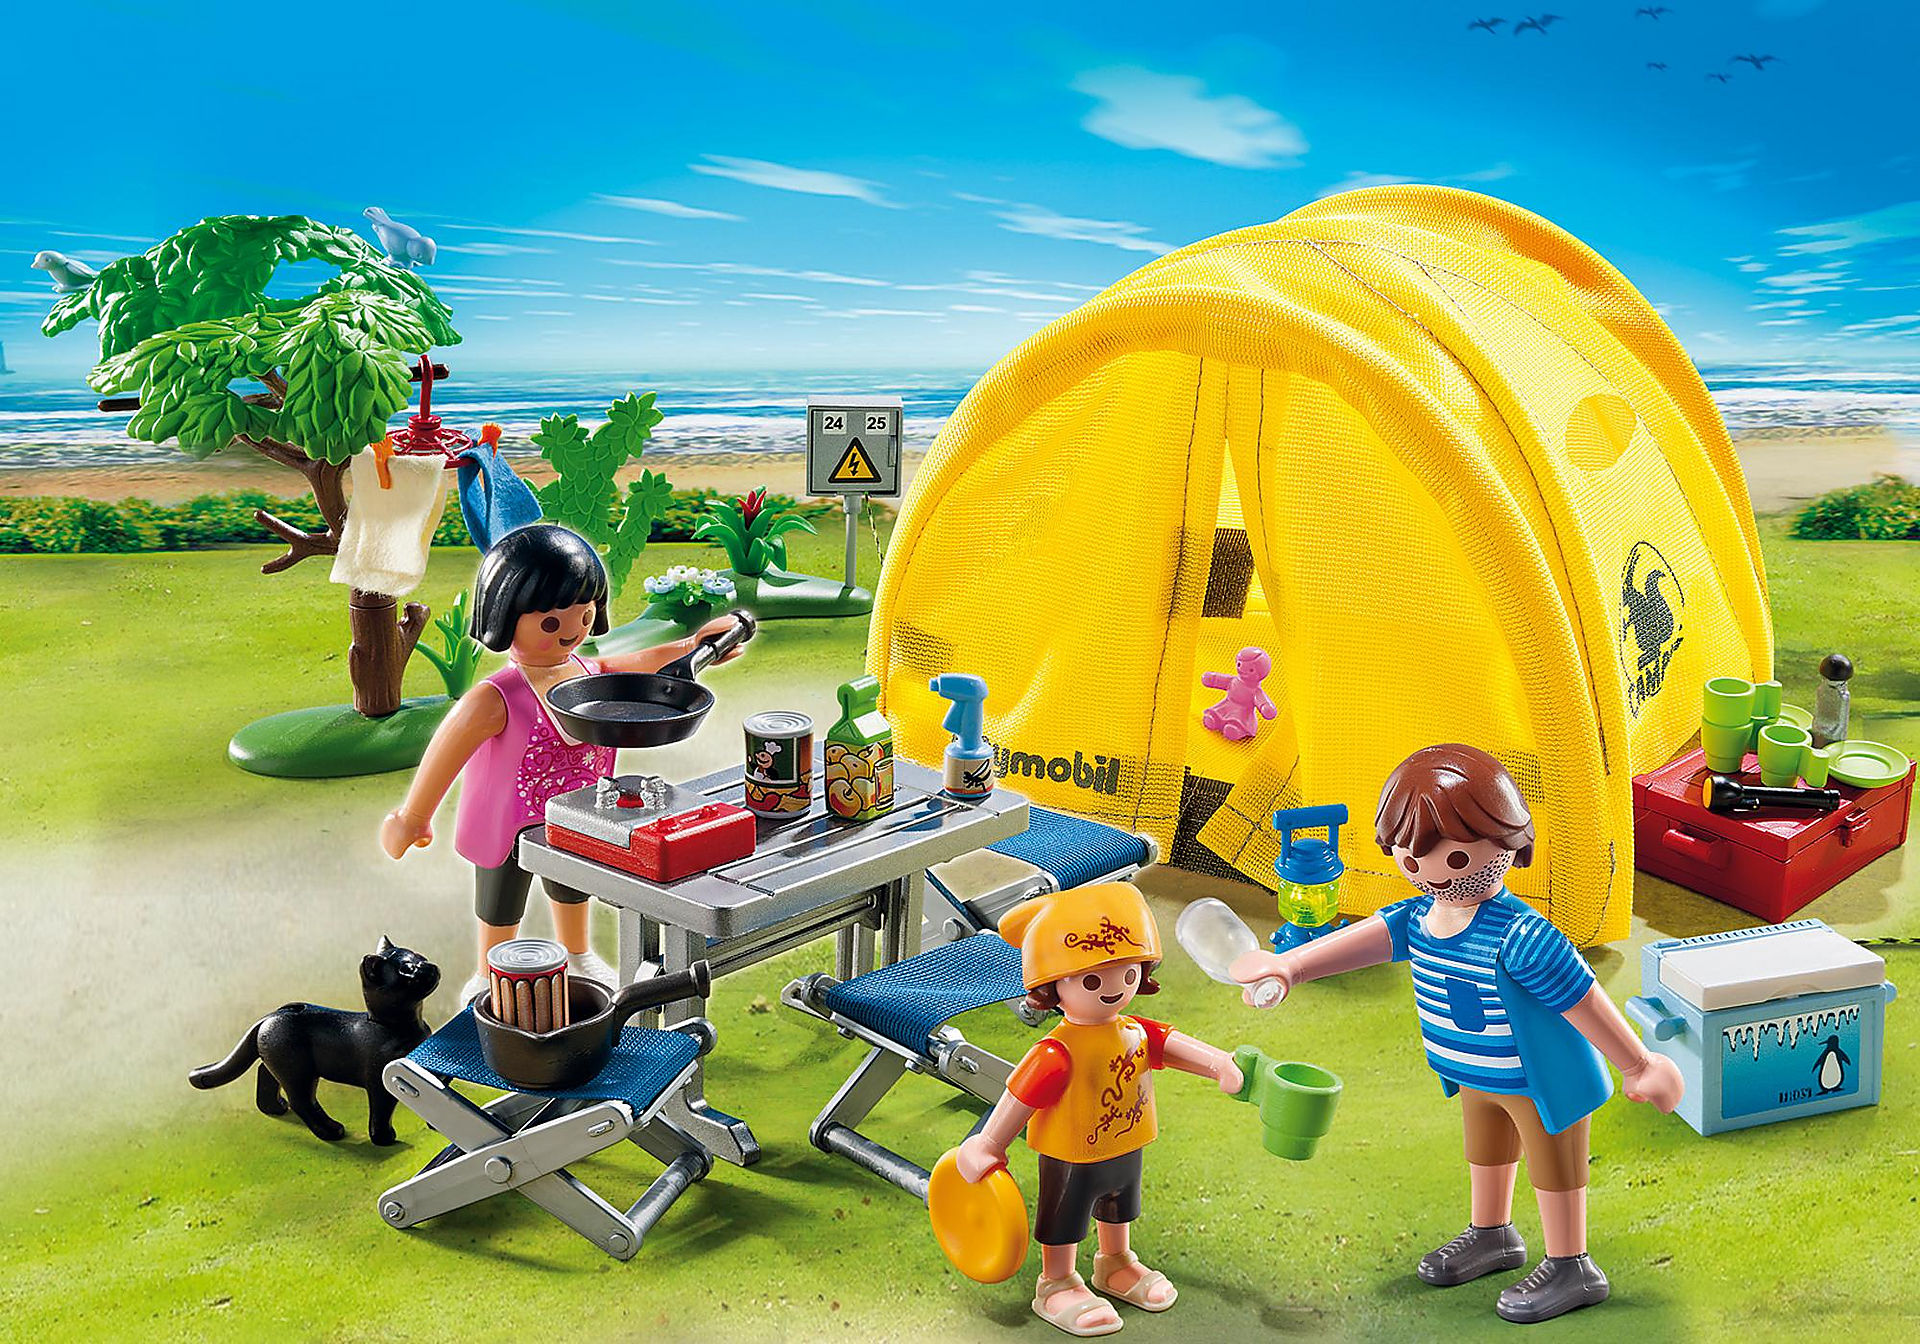 http://media.playmobil.com/i/playmobil/5435_product_detail/Family Camping Trip